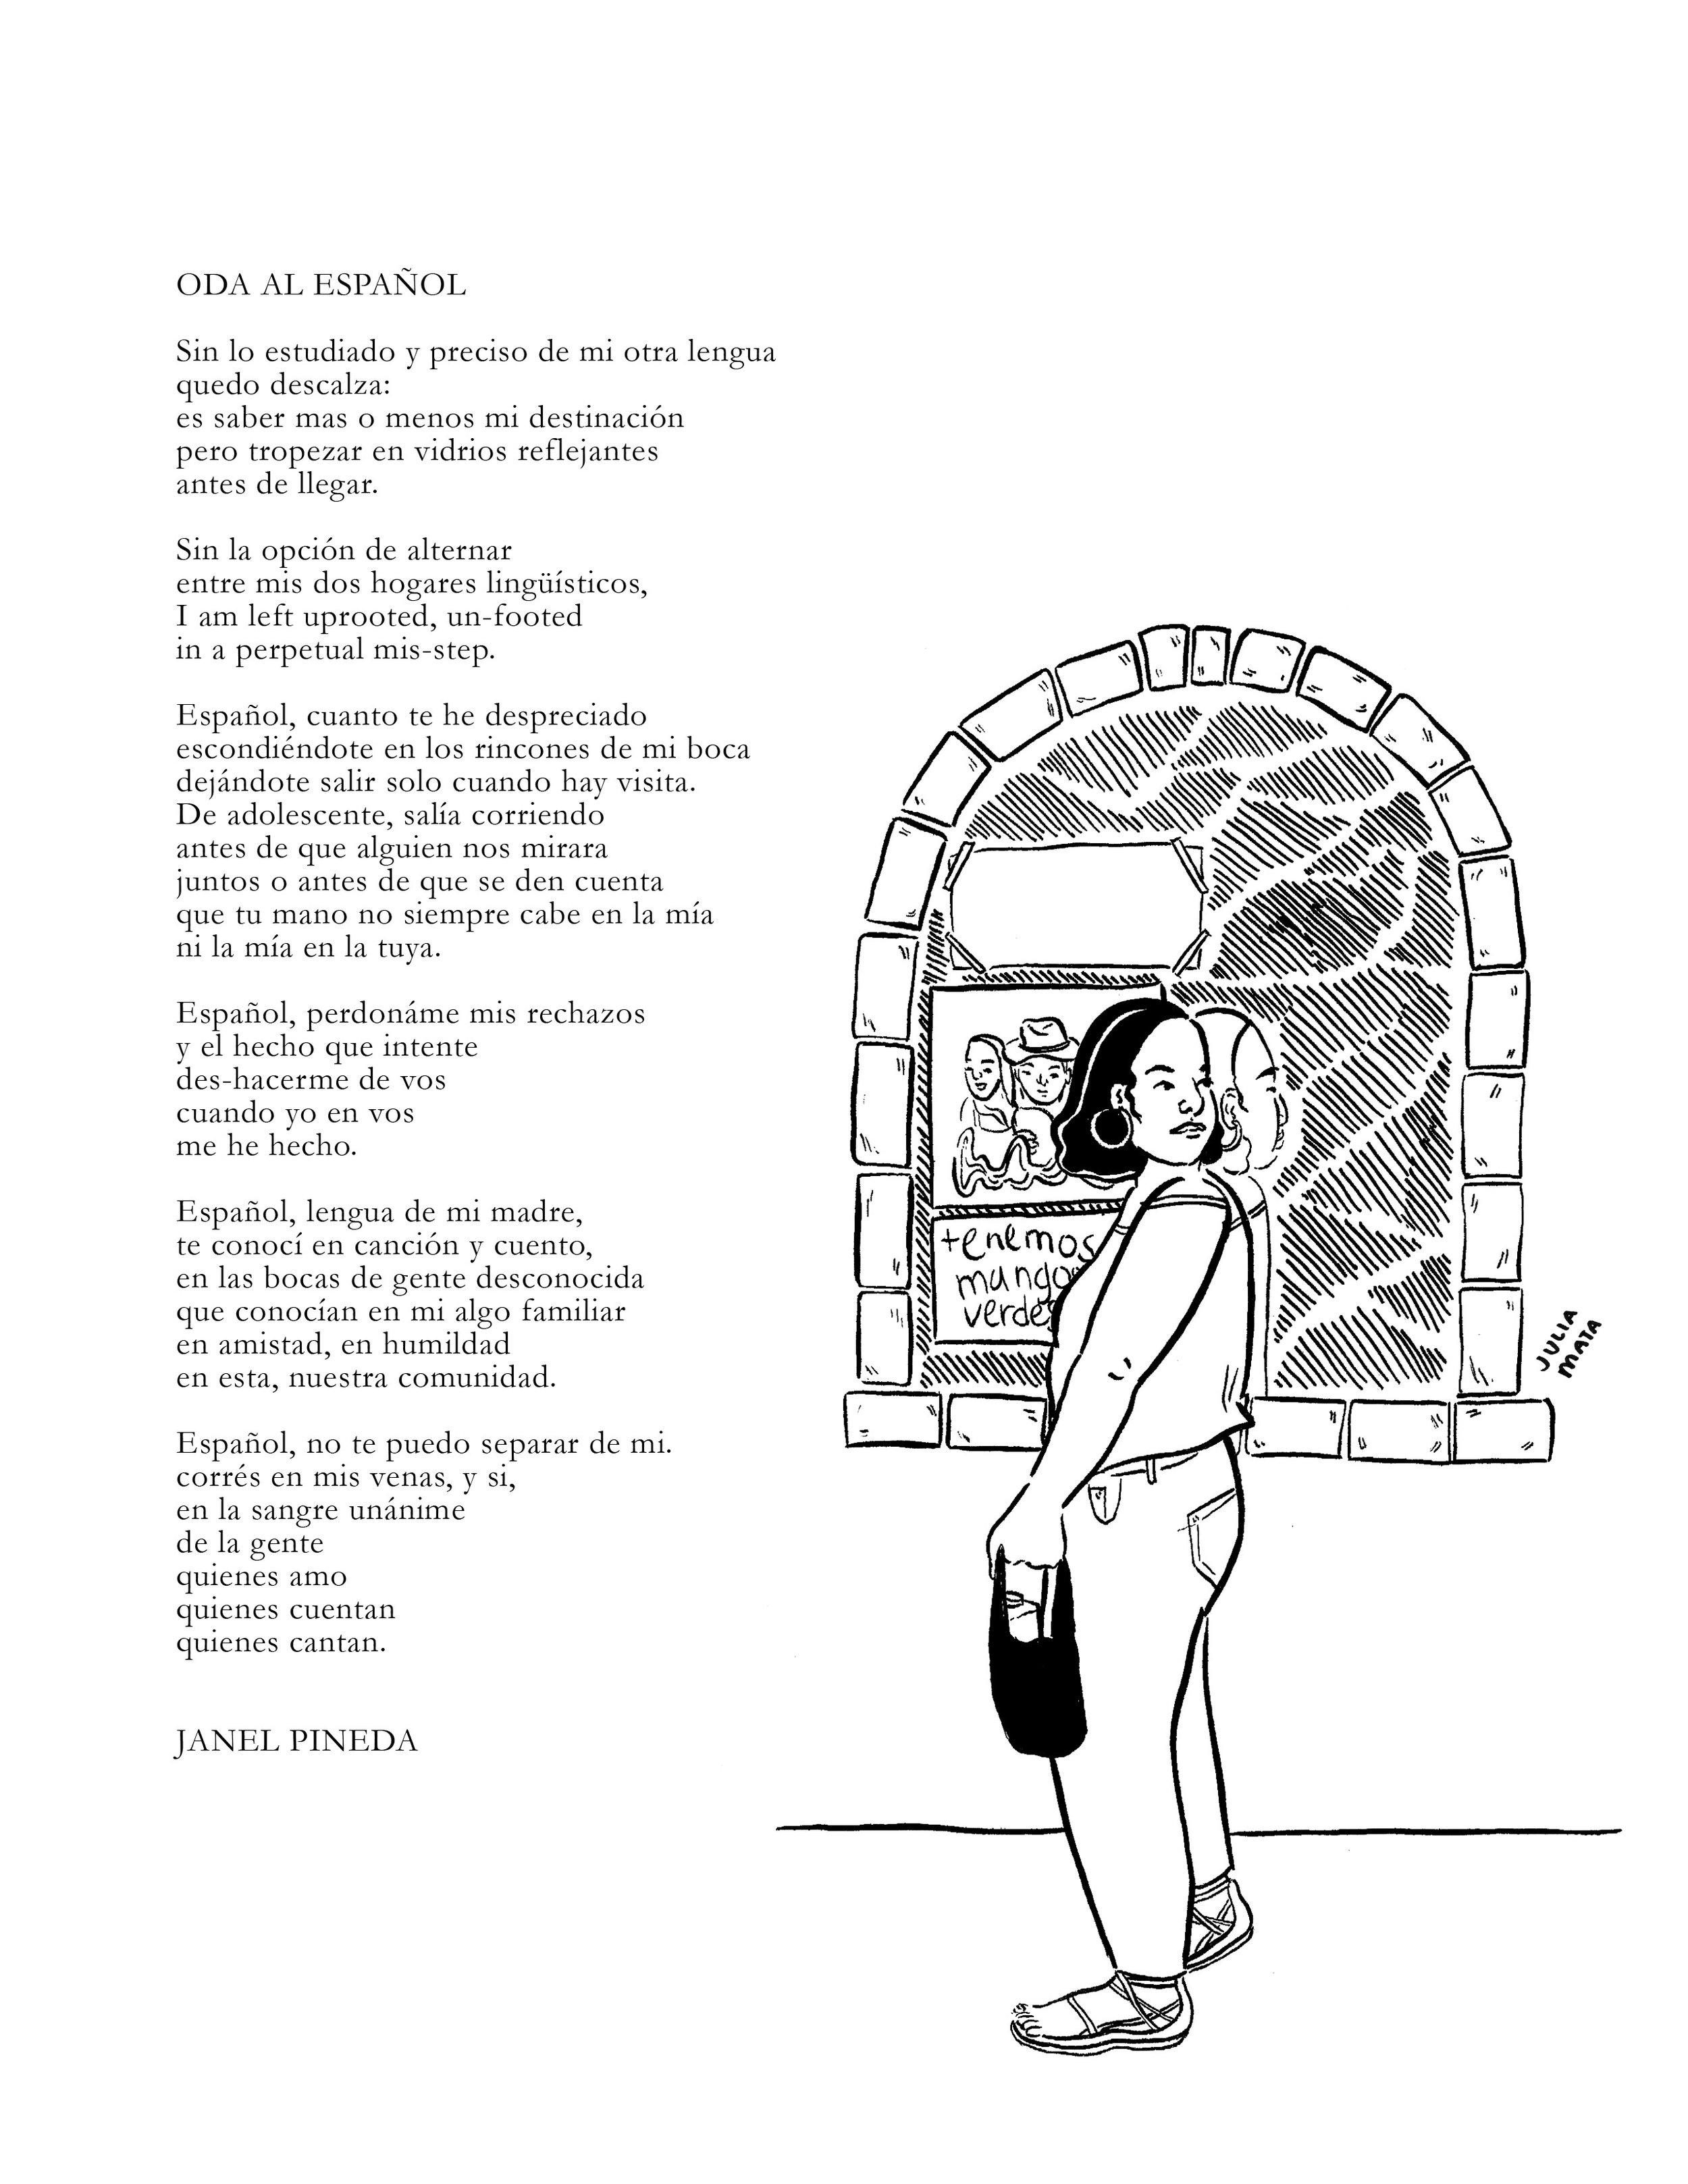 Oda Al Espanol, Illustration in response to poem by Janel Pineda, Ink, 2018.jpg